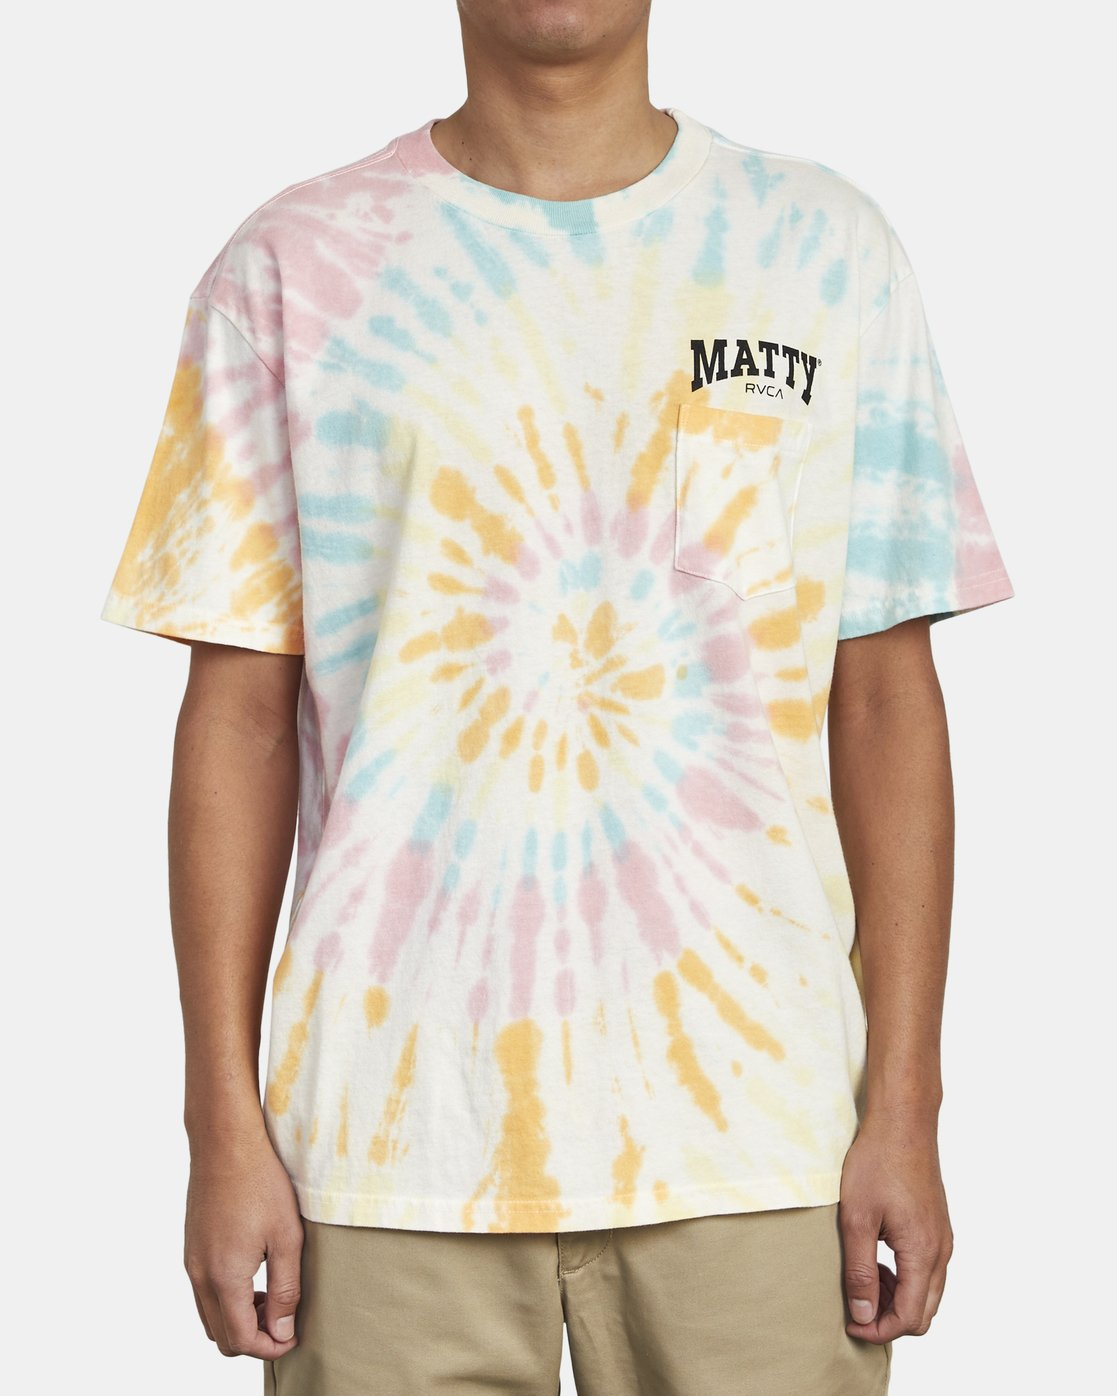 2 MATTY'S TIE DYE TEE  M431WRET RVCA